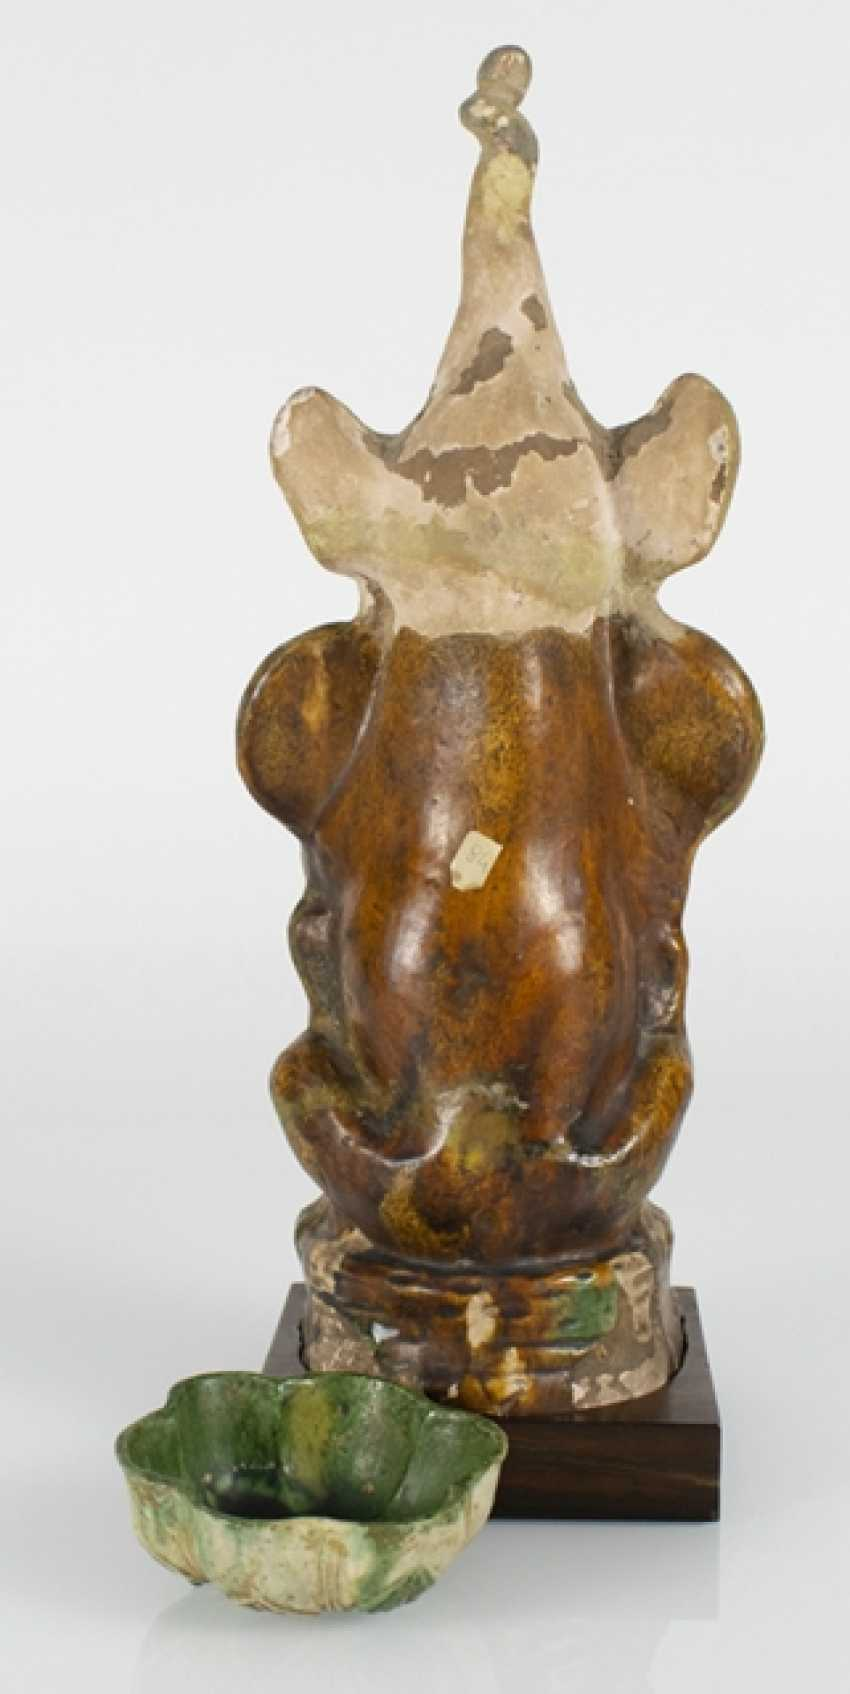 Guardian figure and the flower-shaped bowl with Sancai glaze - photo 3